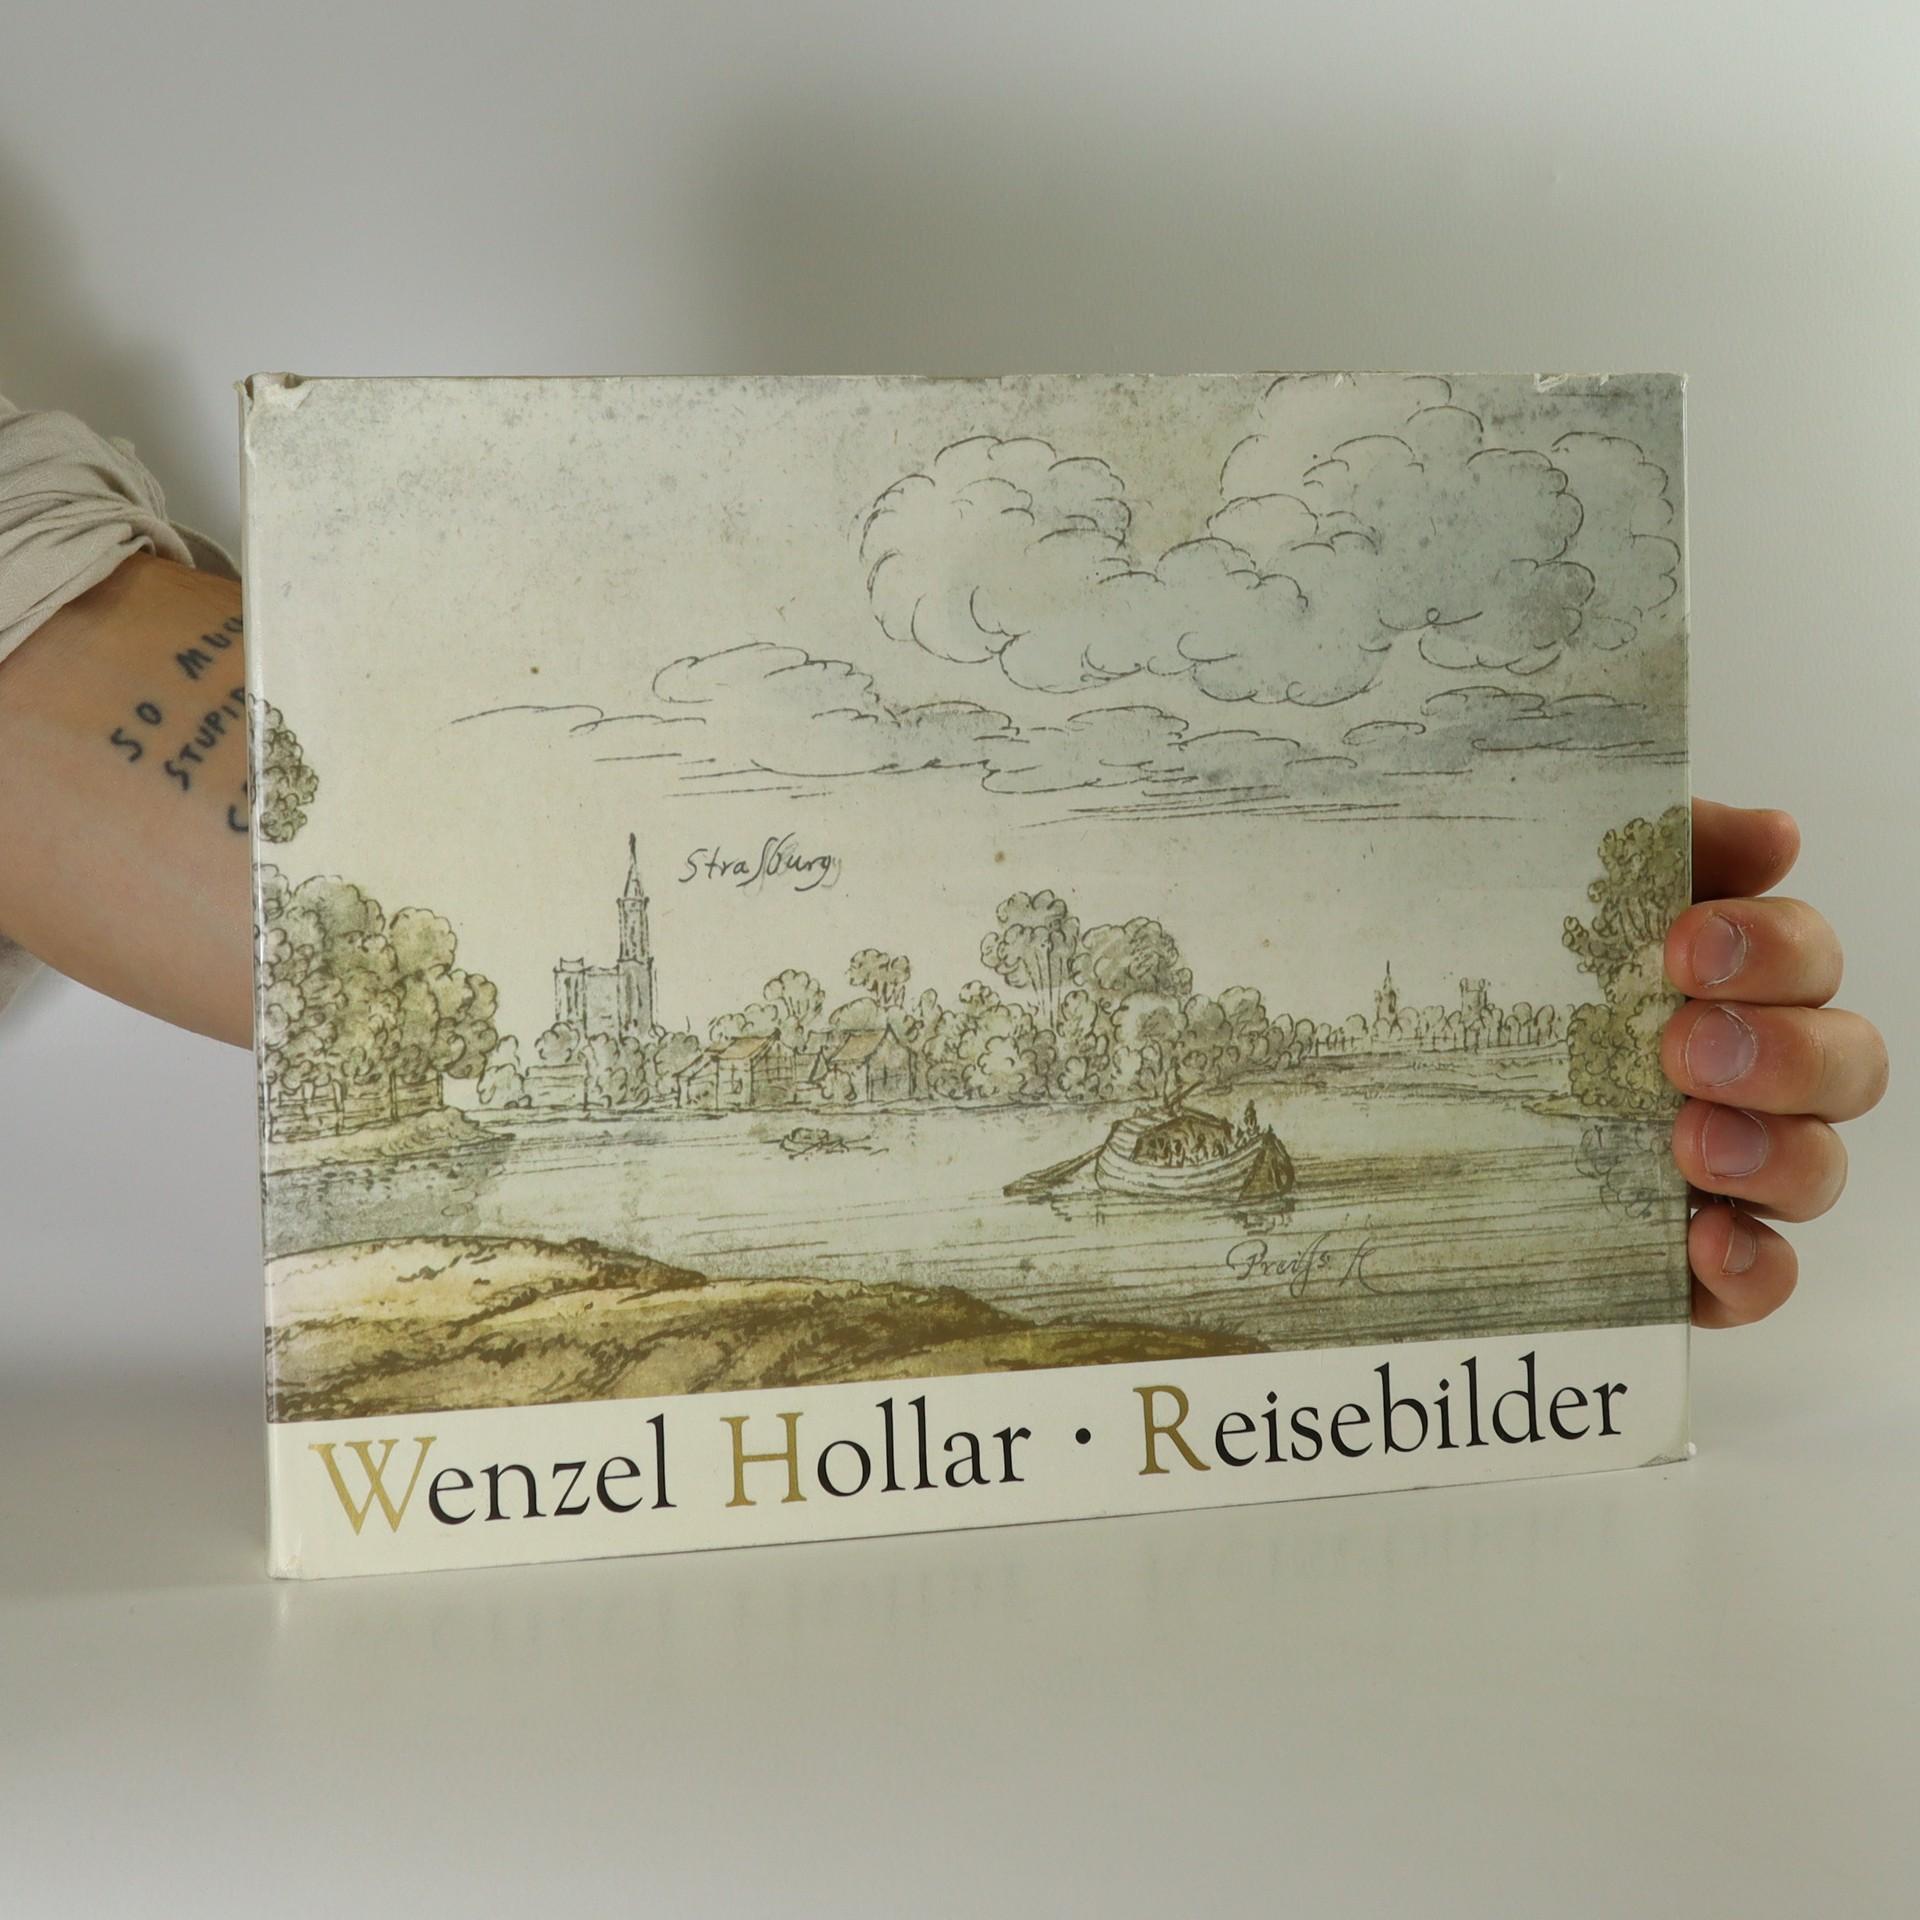 antikvární kniha Wenzel Hollar. Reisebilder, neuveden